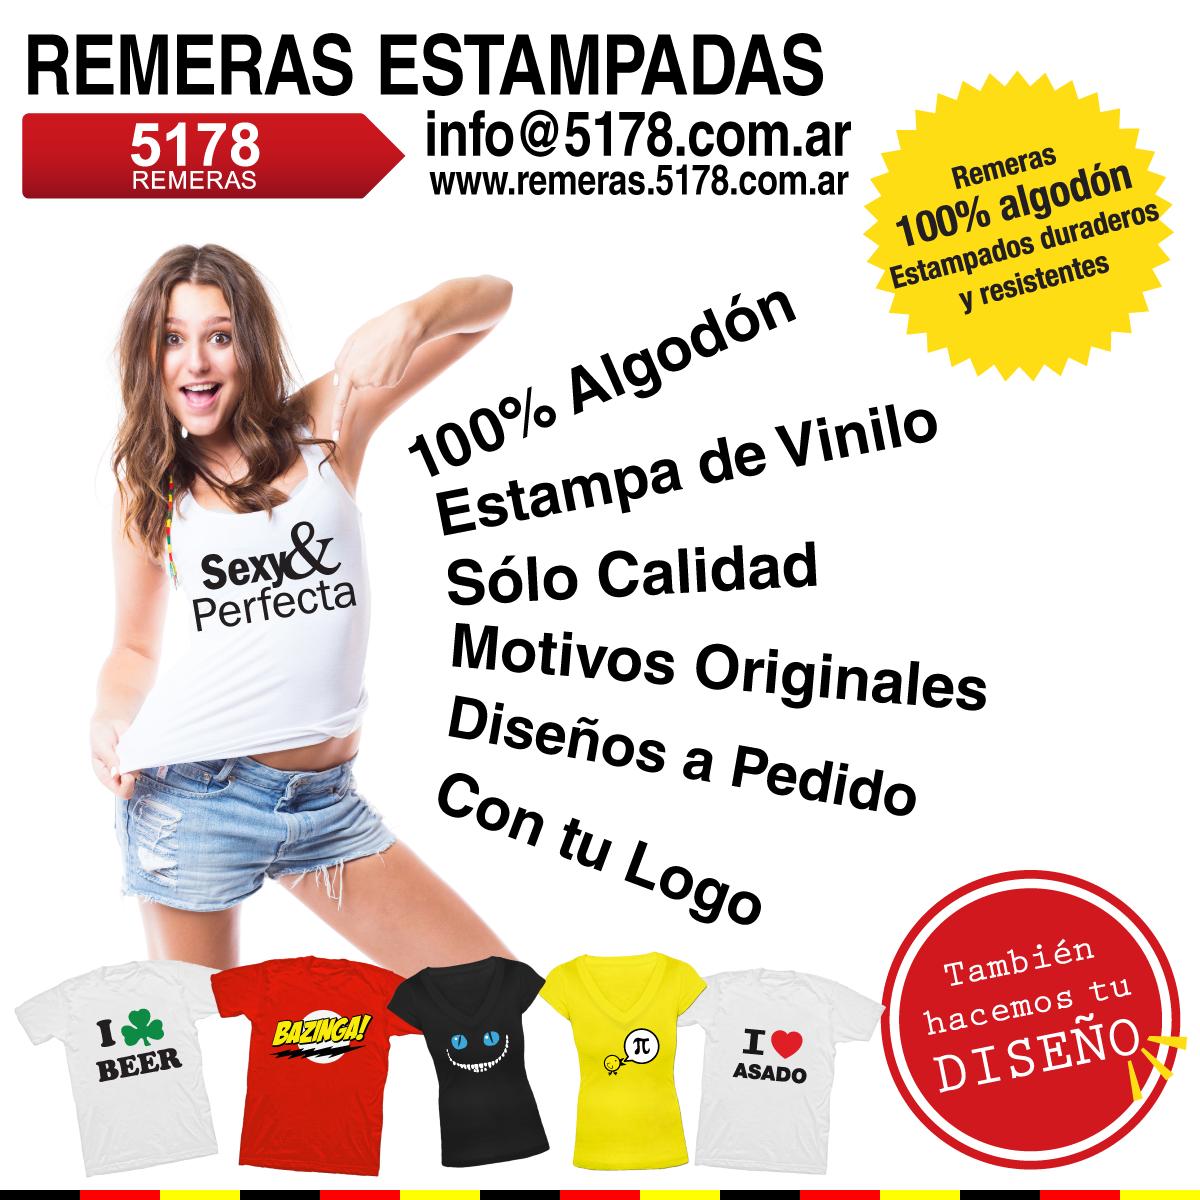 Remeras Estampadas!! El catálogo mas completo de Remeras Estampadas de Argentina:  www.remeras.5178.com.ar